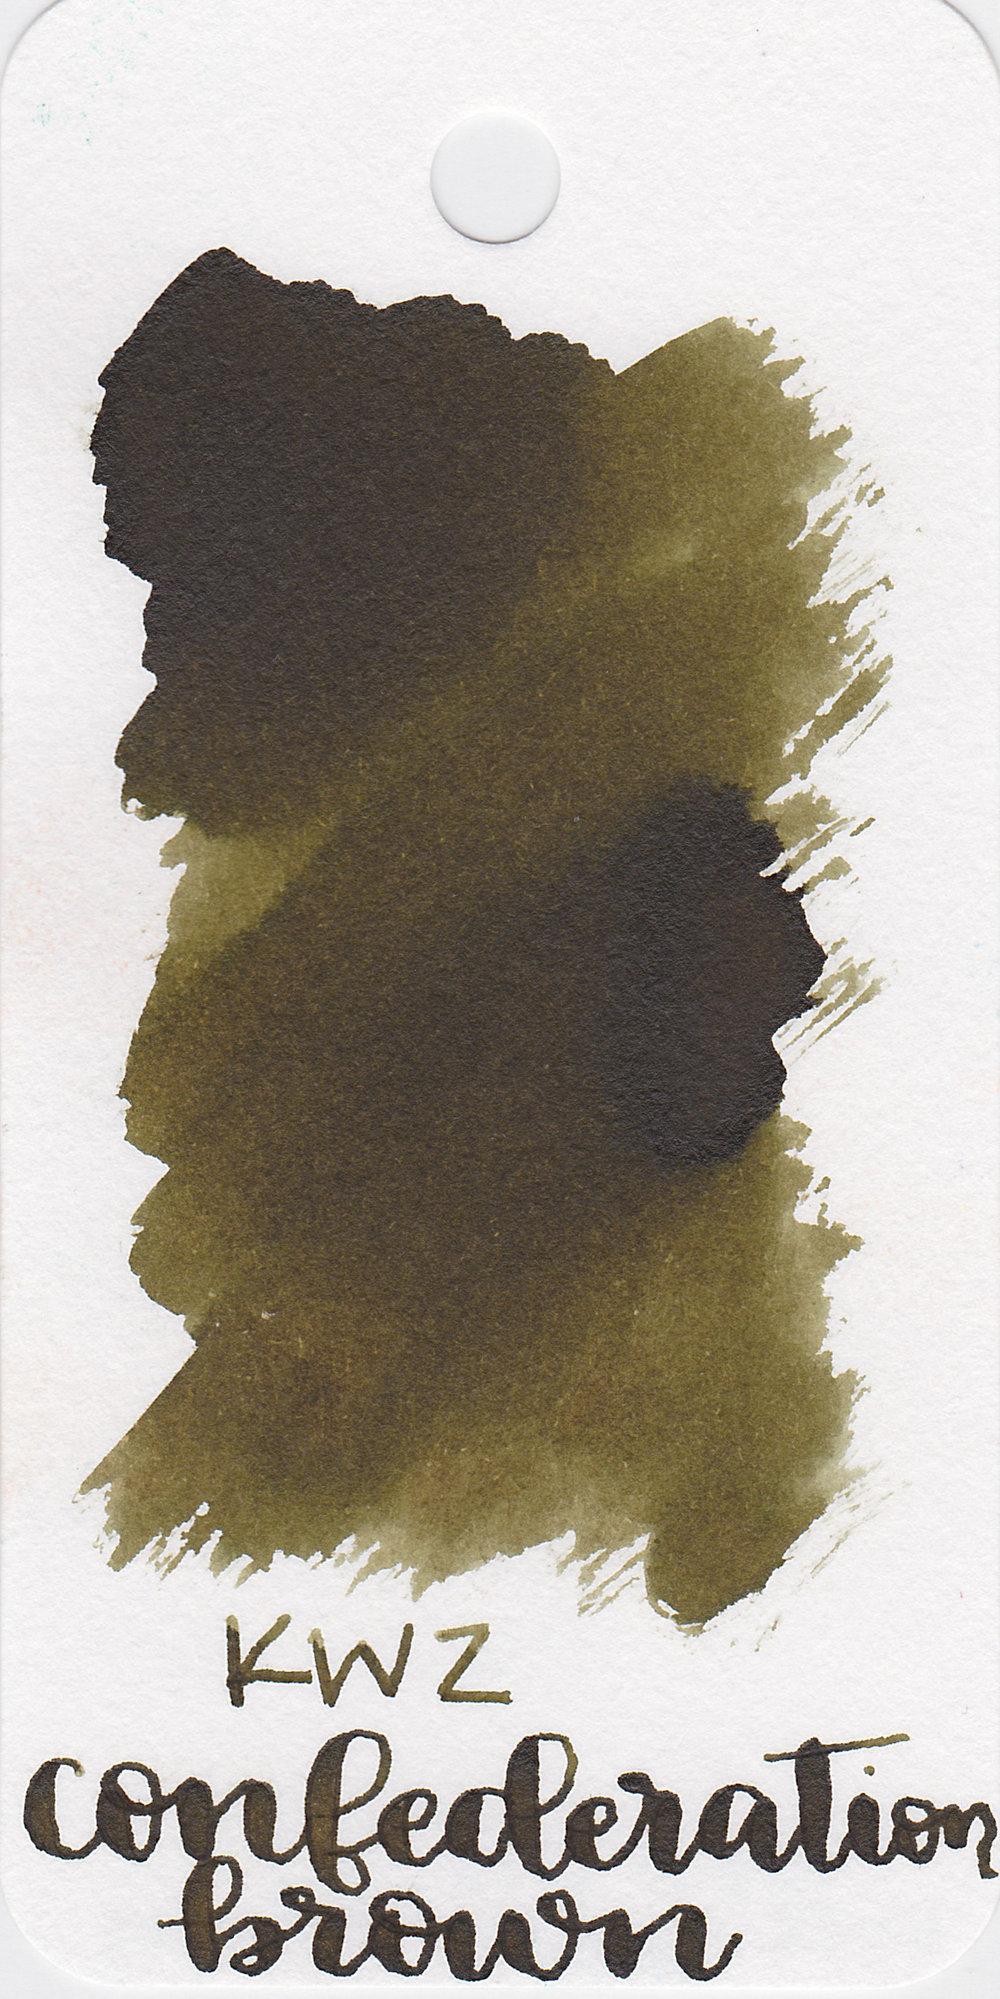 kwz-confederation-brown-1.jpg